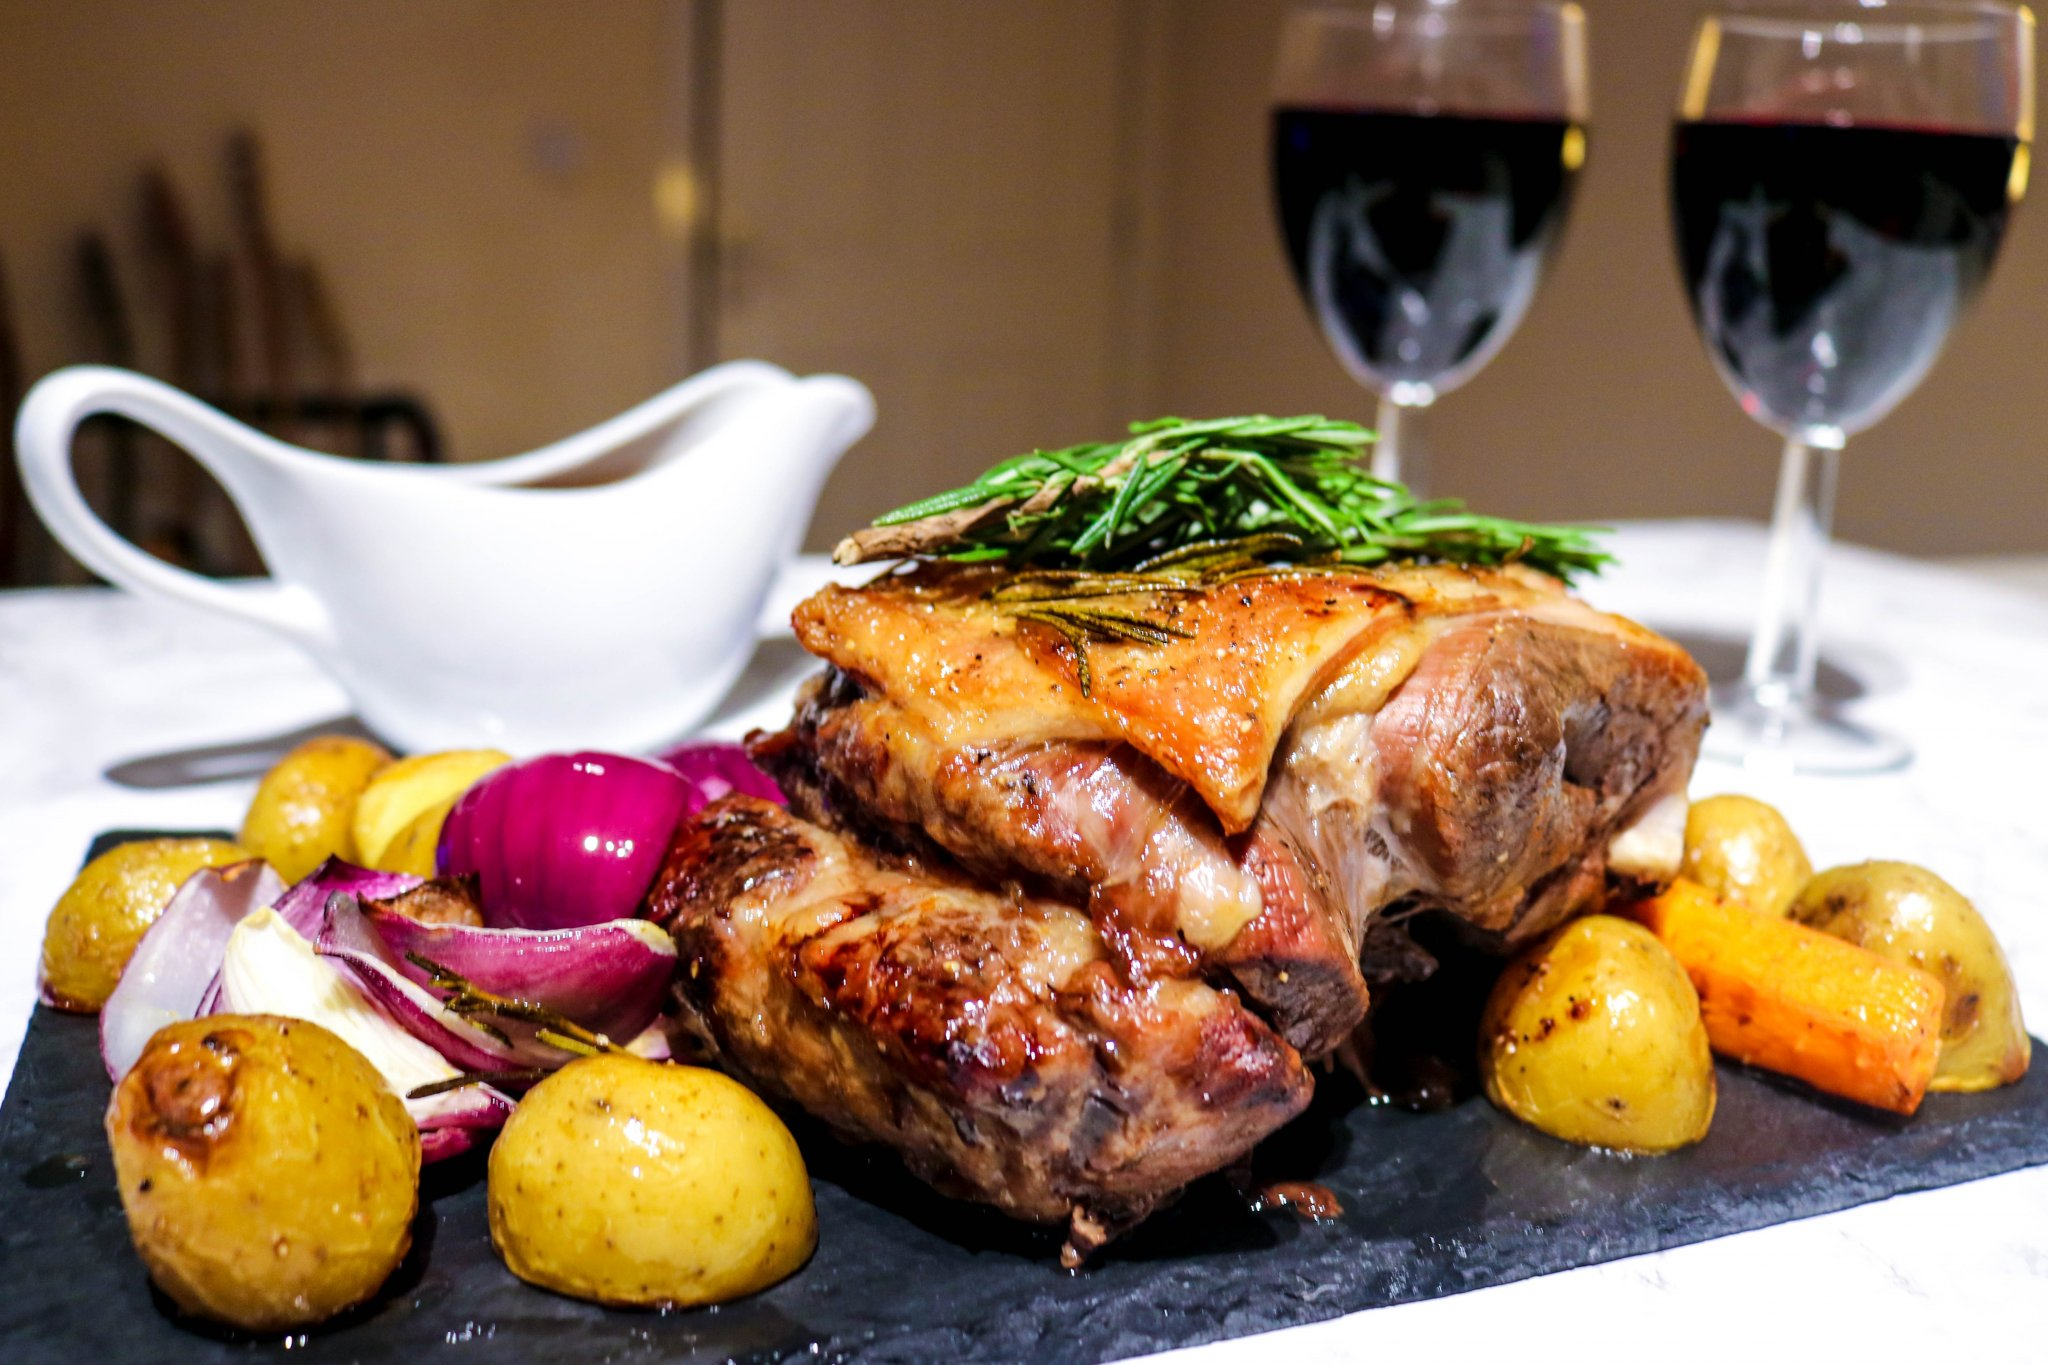 Welsh inspired recipes - Dinner menu using Welsh produce